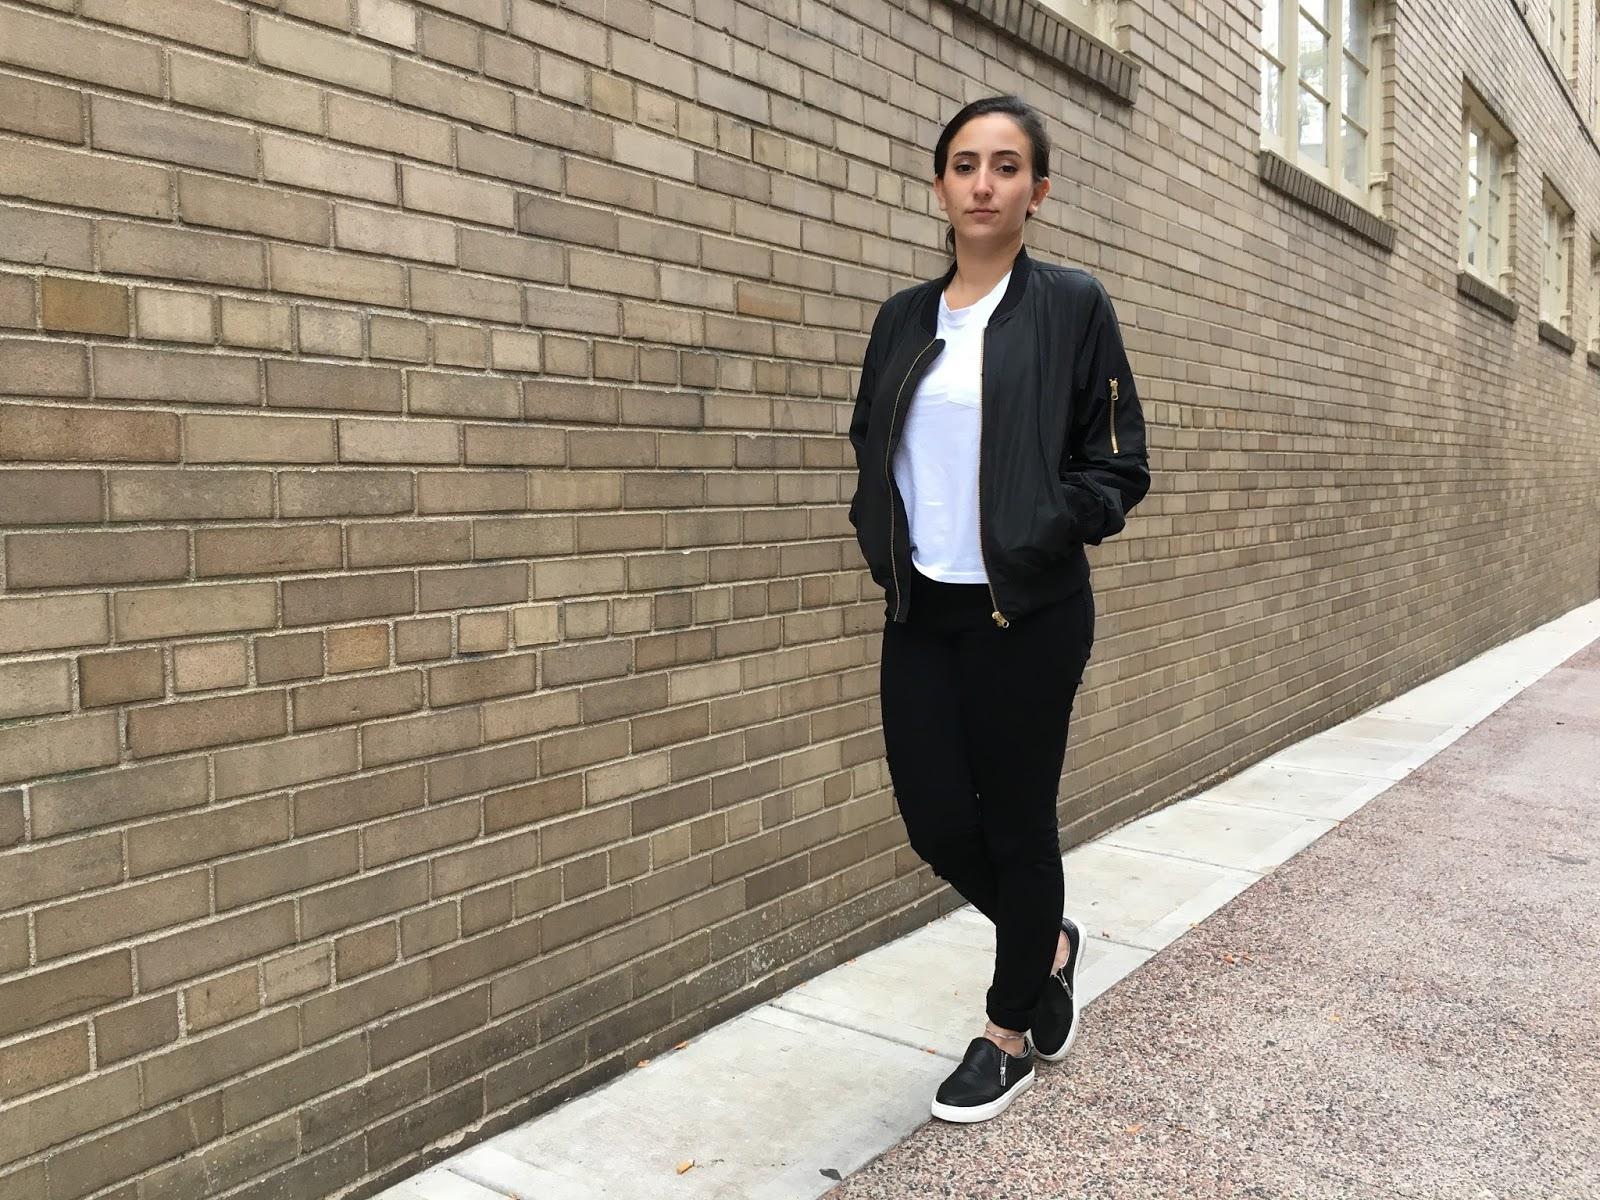 Black Bomber Jacket, Black Jeans, Black Sneakers